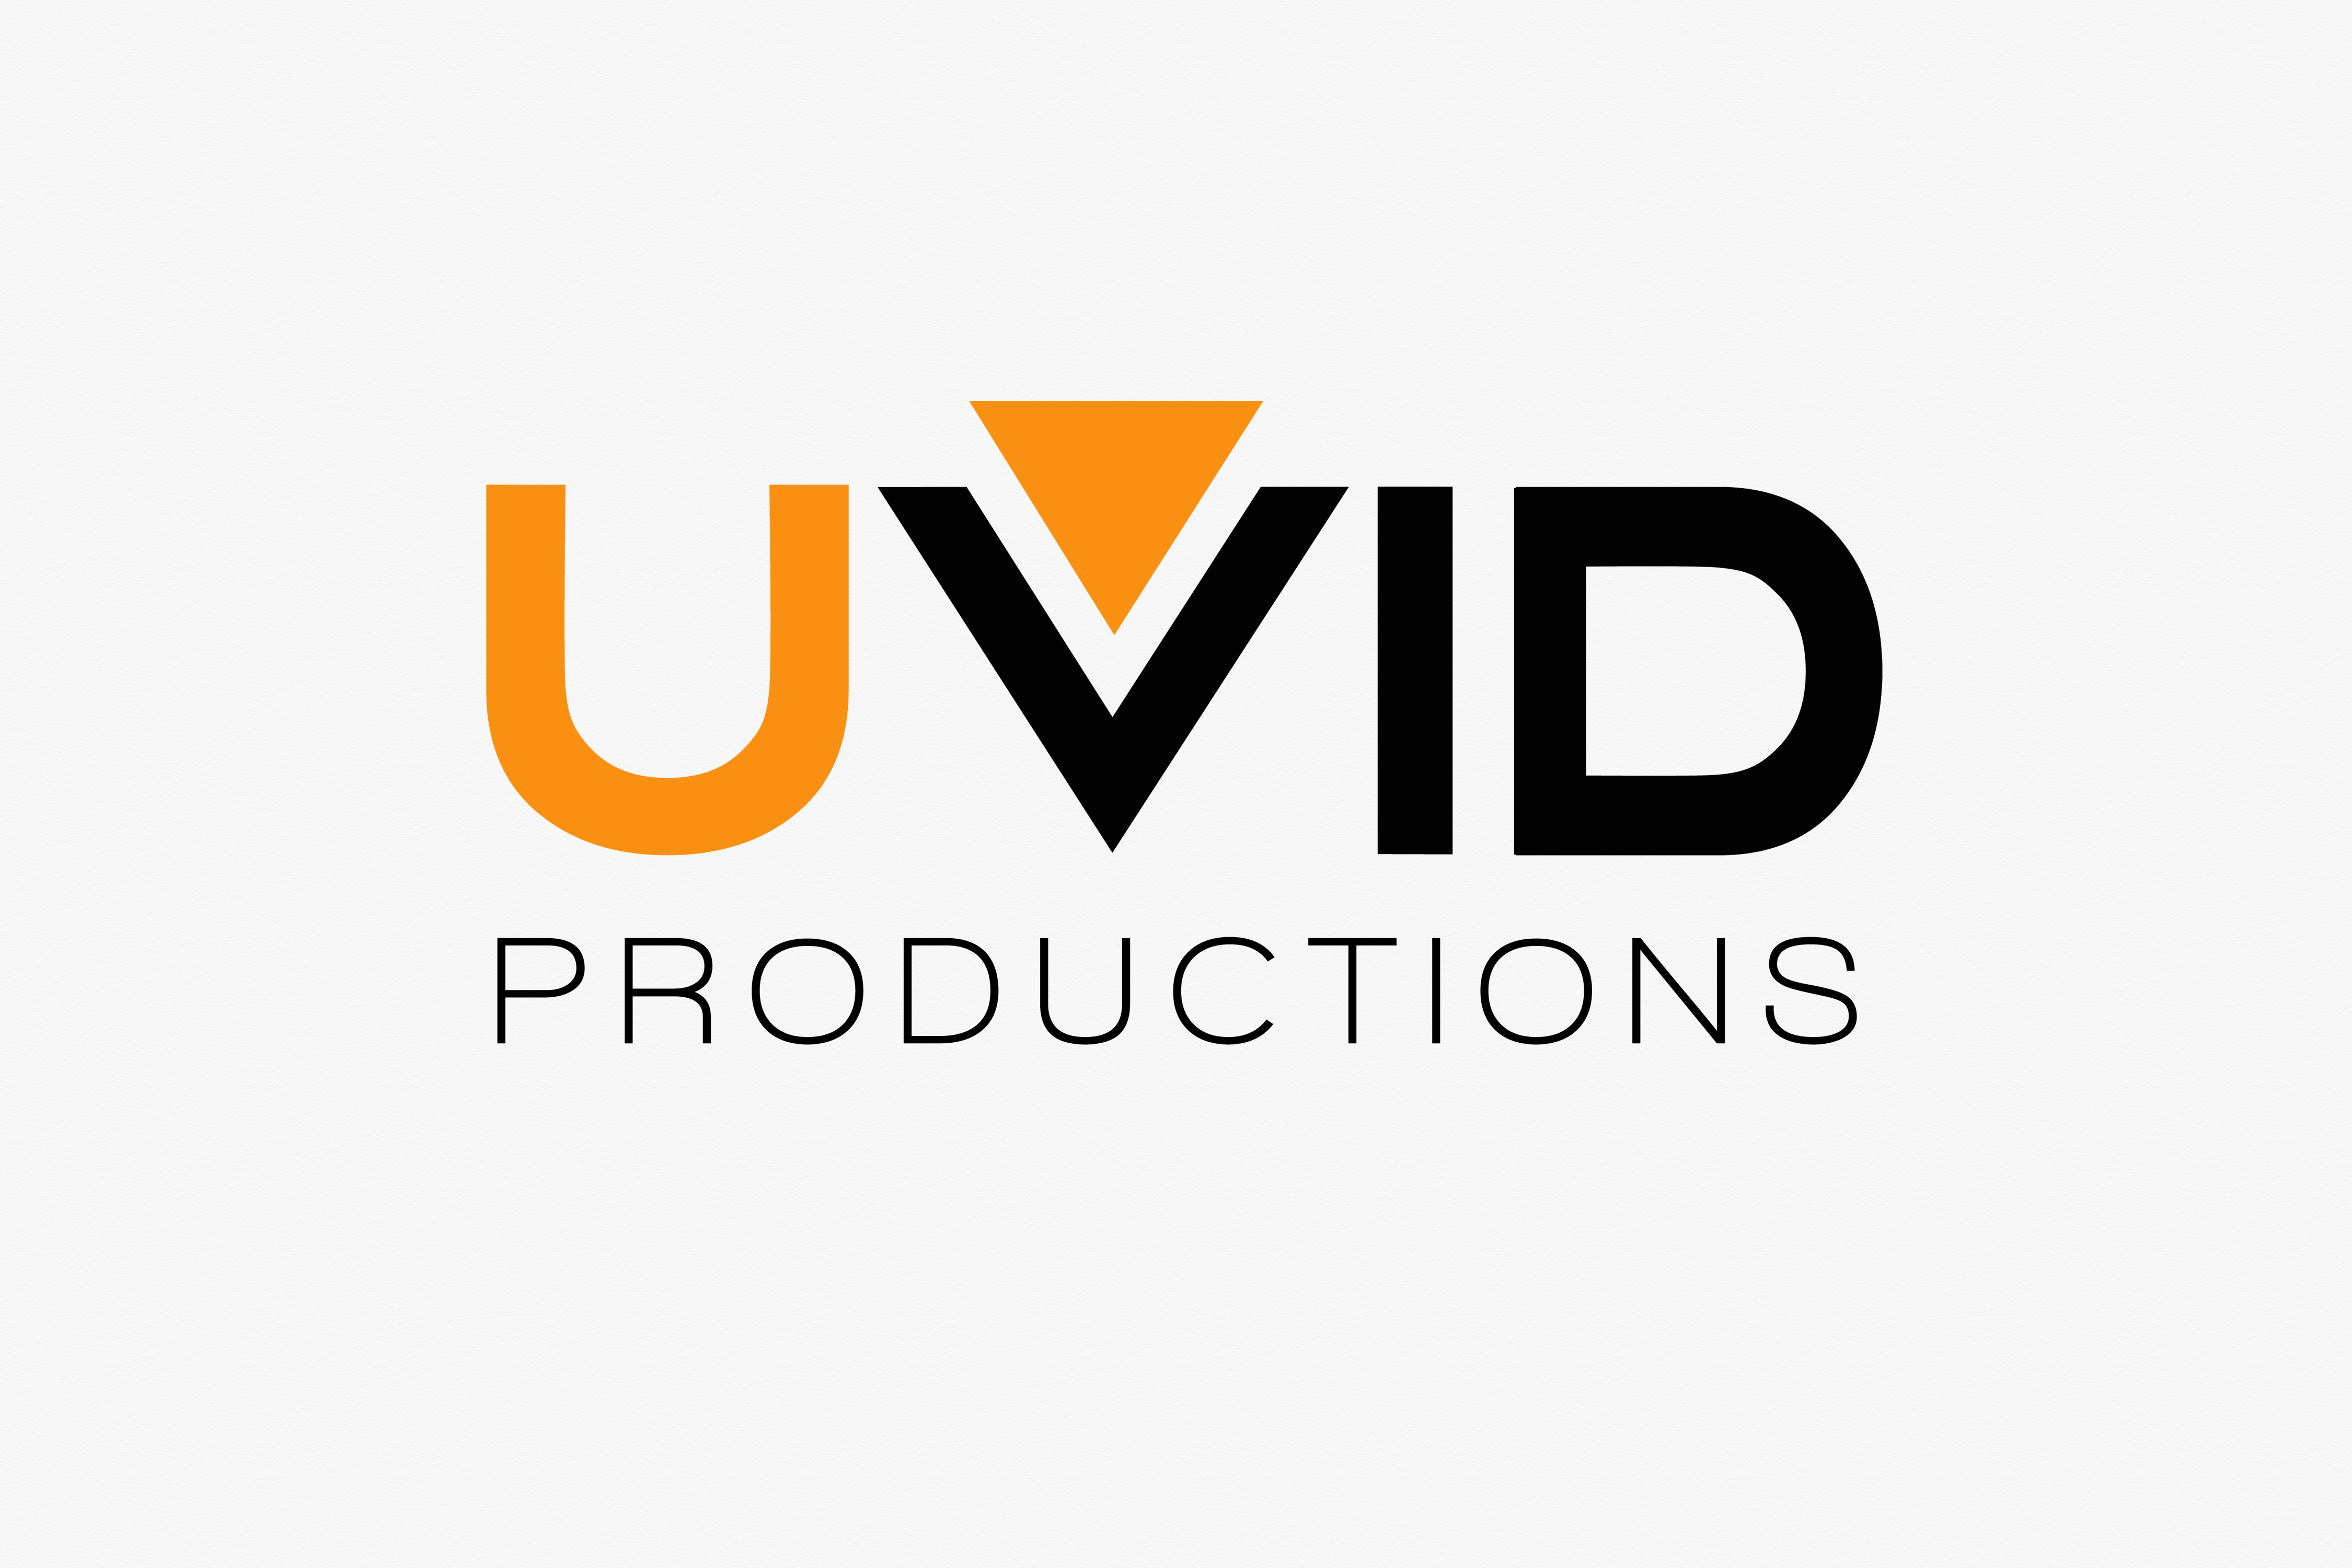 UVID Logo